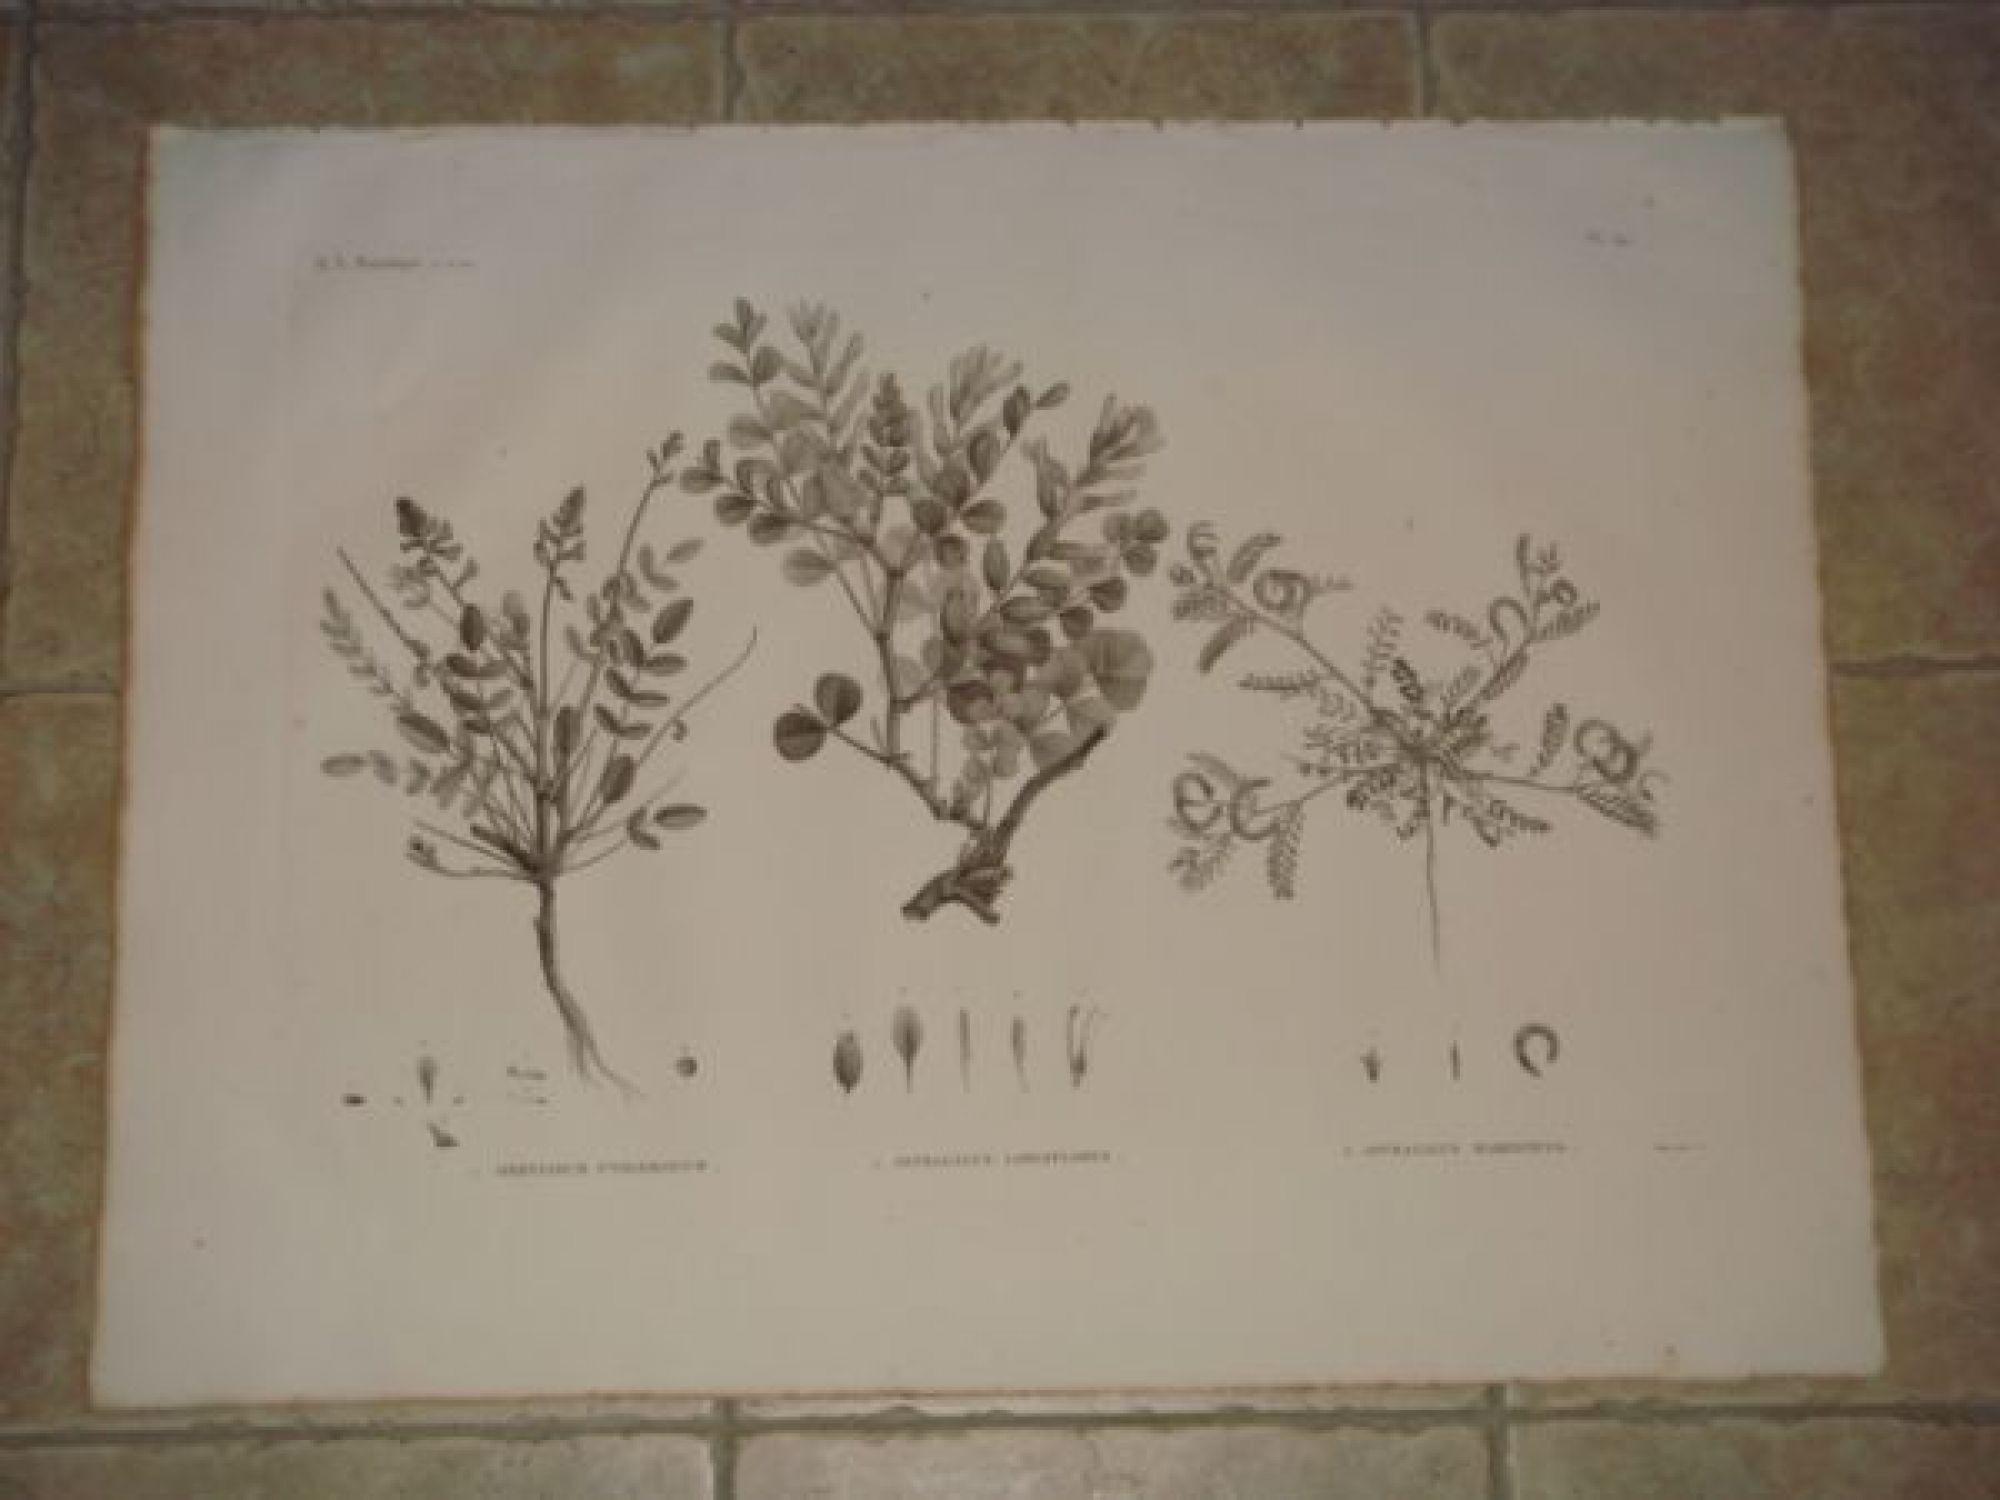 description de l 39 egypte botanique hedysarum ptolemaicum astragalus longiflorus astragalus. Black Bedroom Furniture Sets. Home Design Ideas